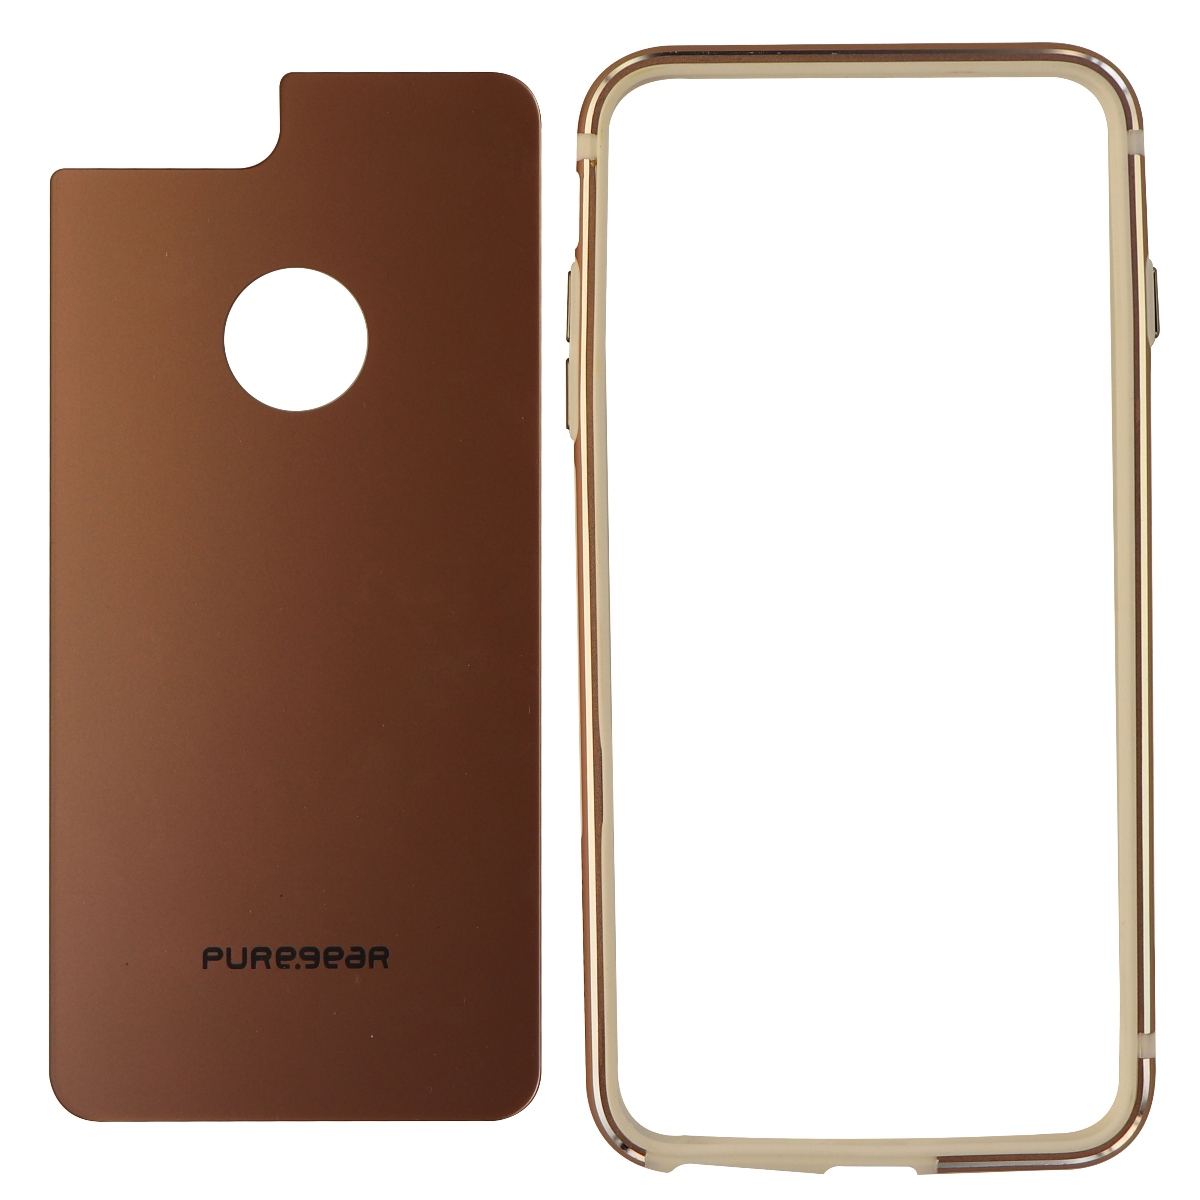 PureGear GlassBak 360 Metal Bumper and Glass for iPhone 7 Plus 6s Plus - Pink